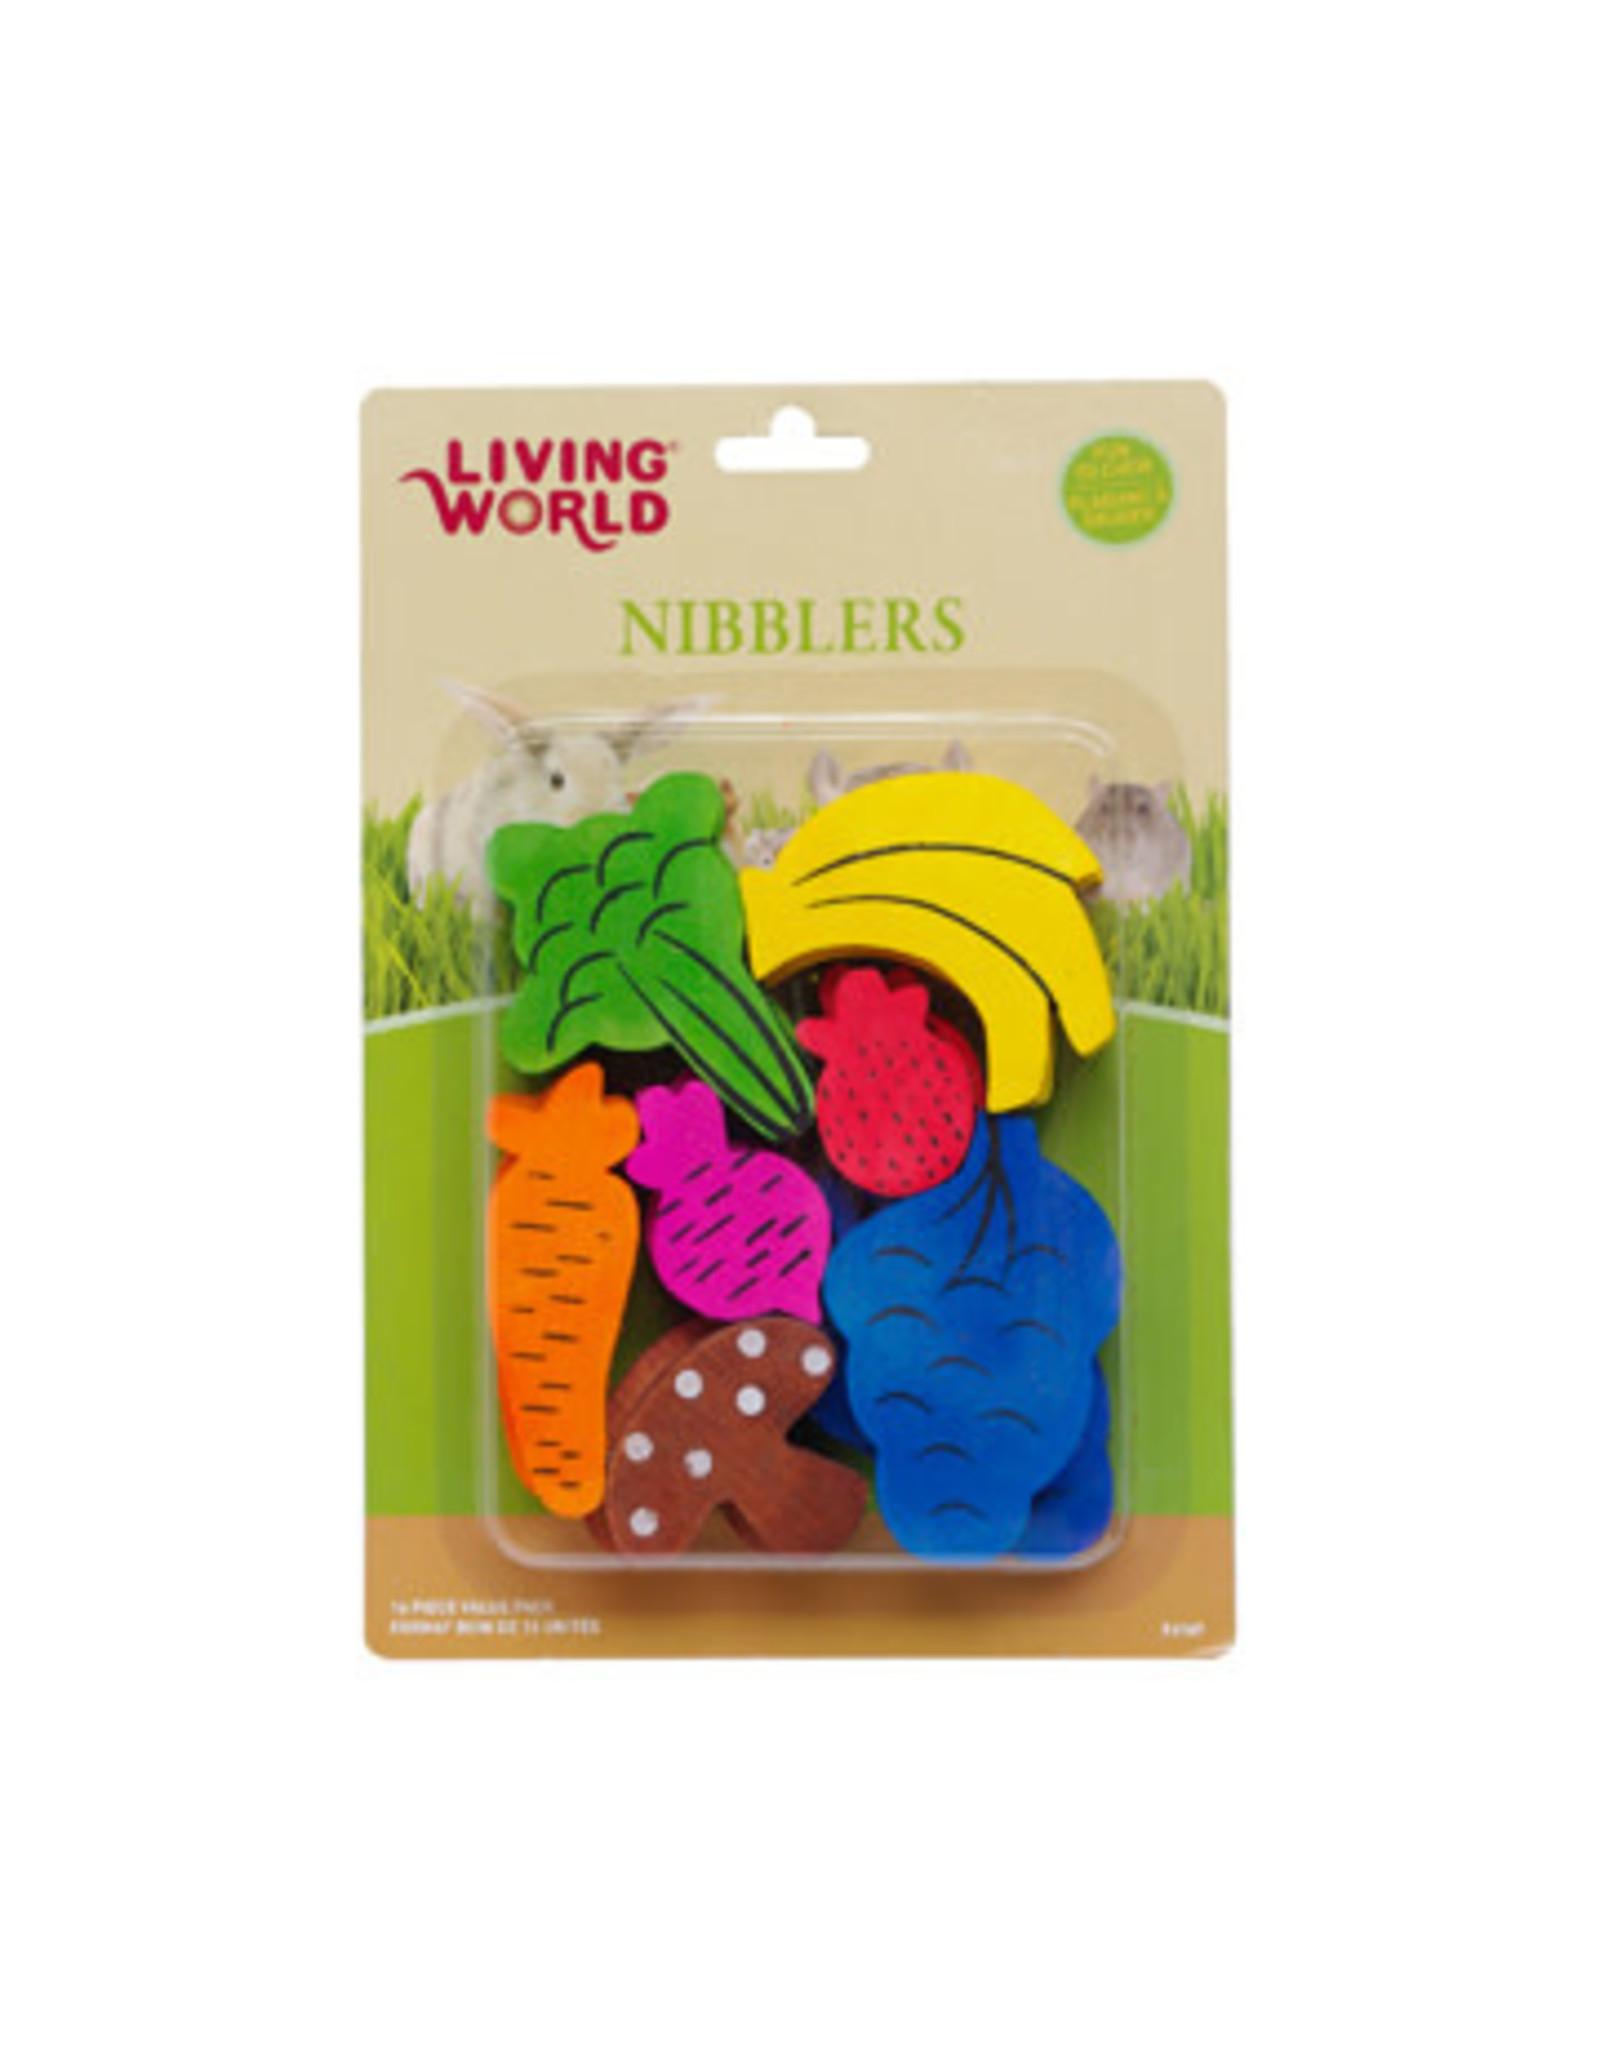 Living World Living World Nibblers Wood Chews - Fruit/Veggie Mix